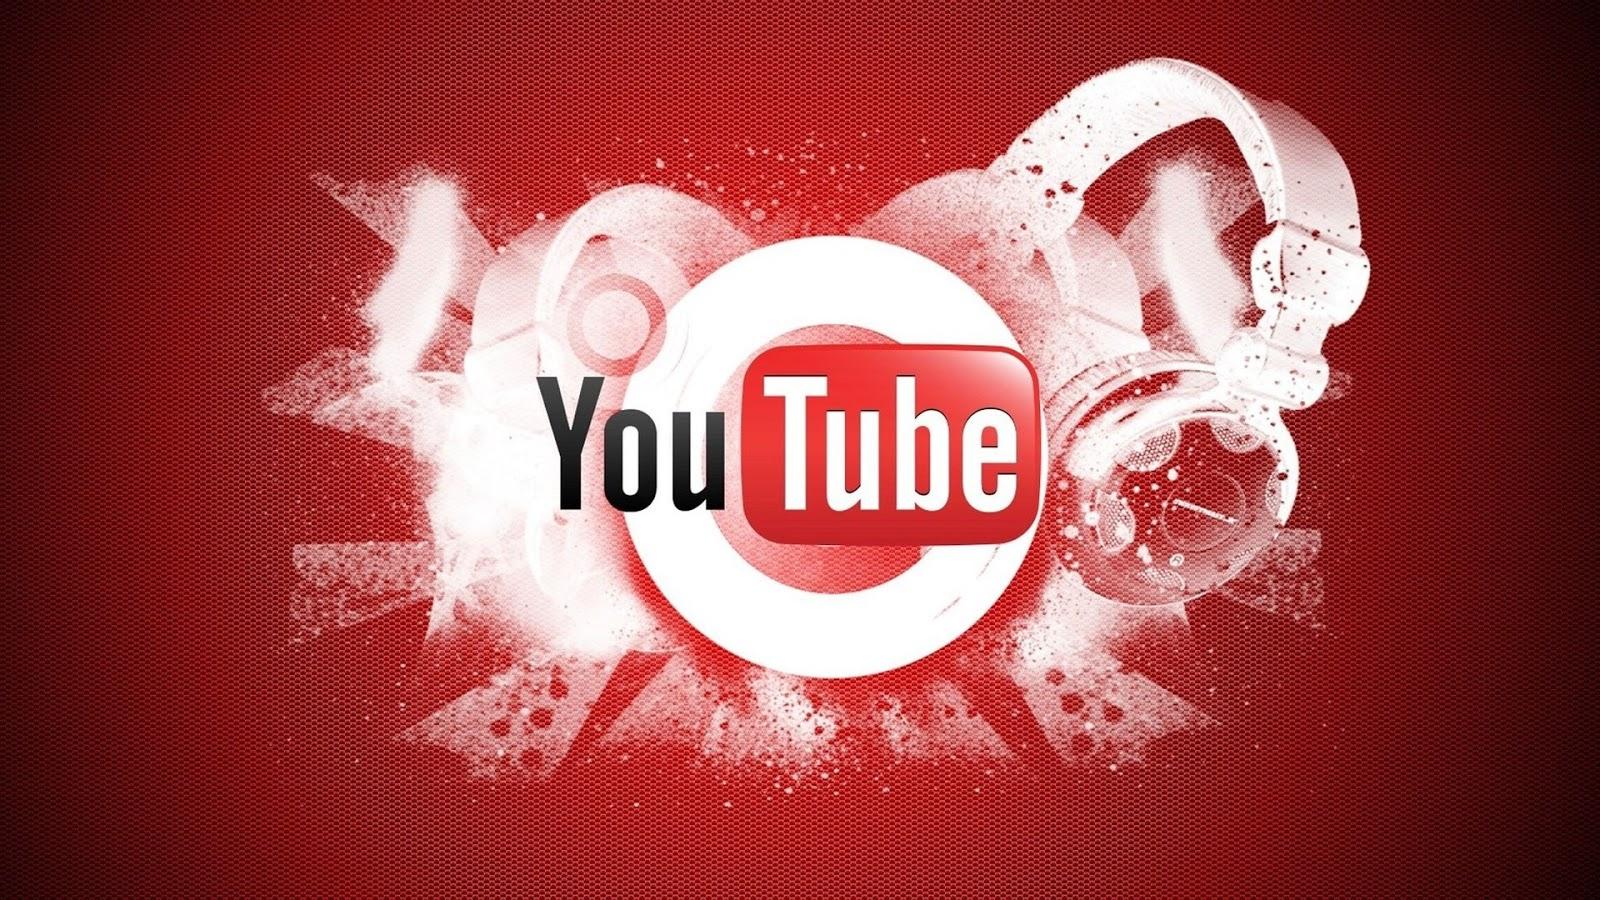 http://3.bp.blogspot.com/-UDbPwzTp7yk/Ubg85nt2zlI/AAAAAAAABDQ/NHGpG3XtnIw/s1600/YouTubeLogoBackground16062013_lm.jpg